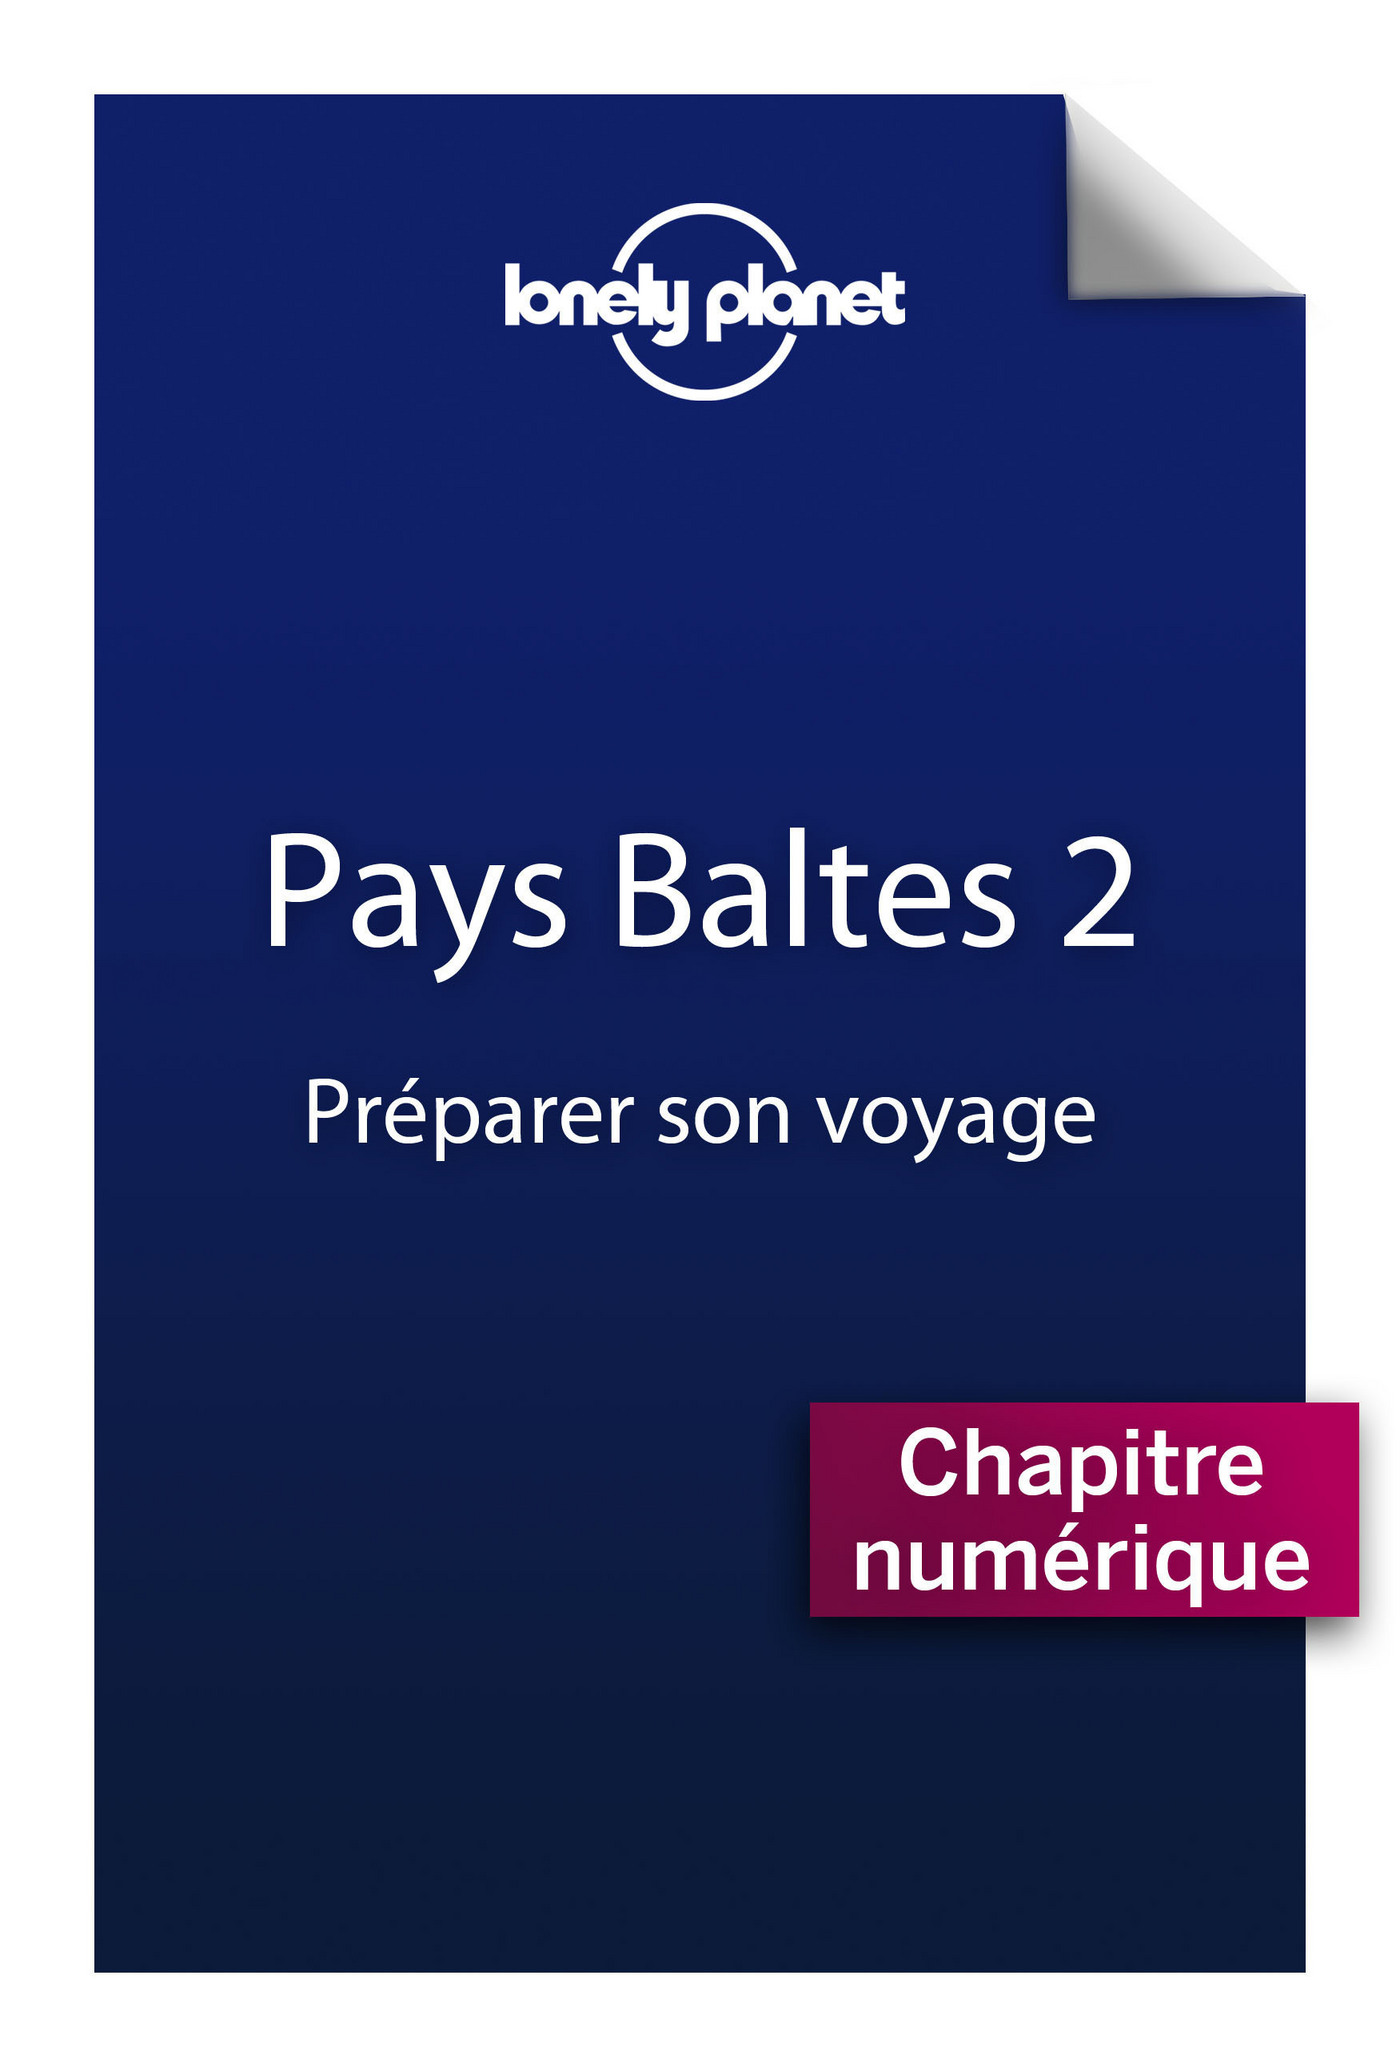 Pays Baltes 2 - Préparer son voyage